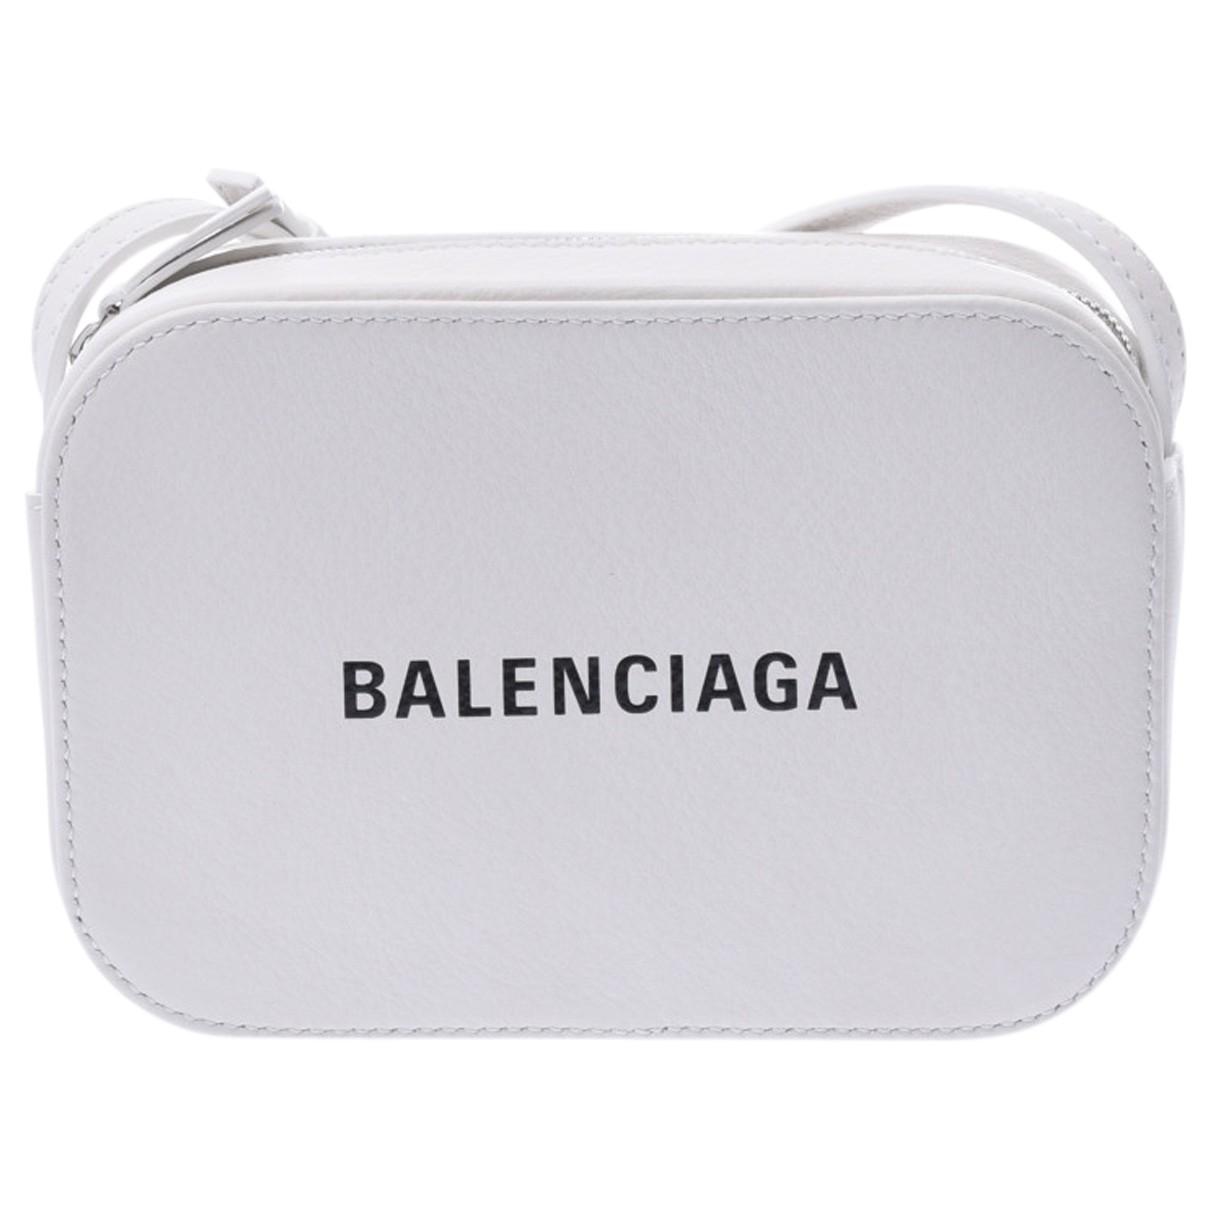 Balenciaga Camera White Leather handbag for Women N